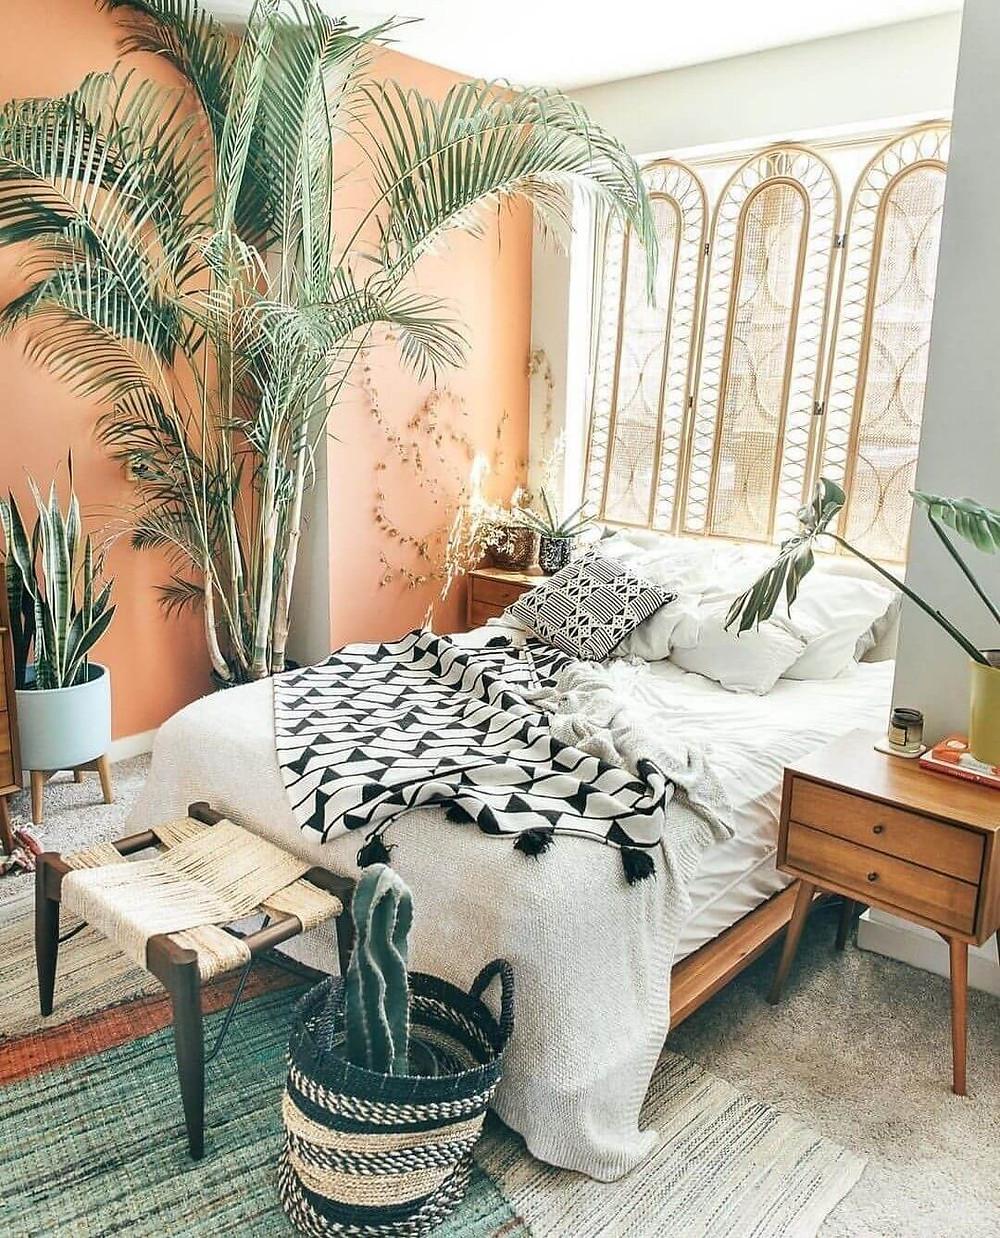 ways to nail bohemian style, bohemian style bedroom